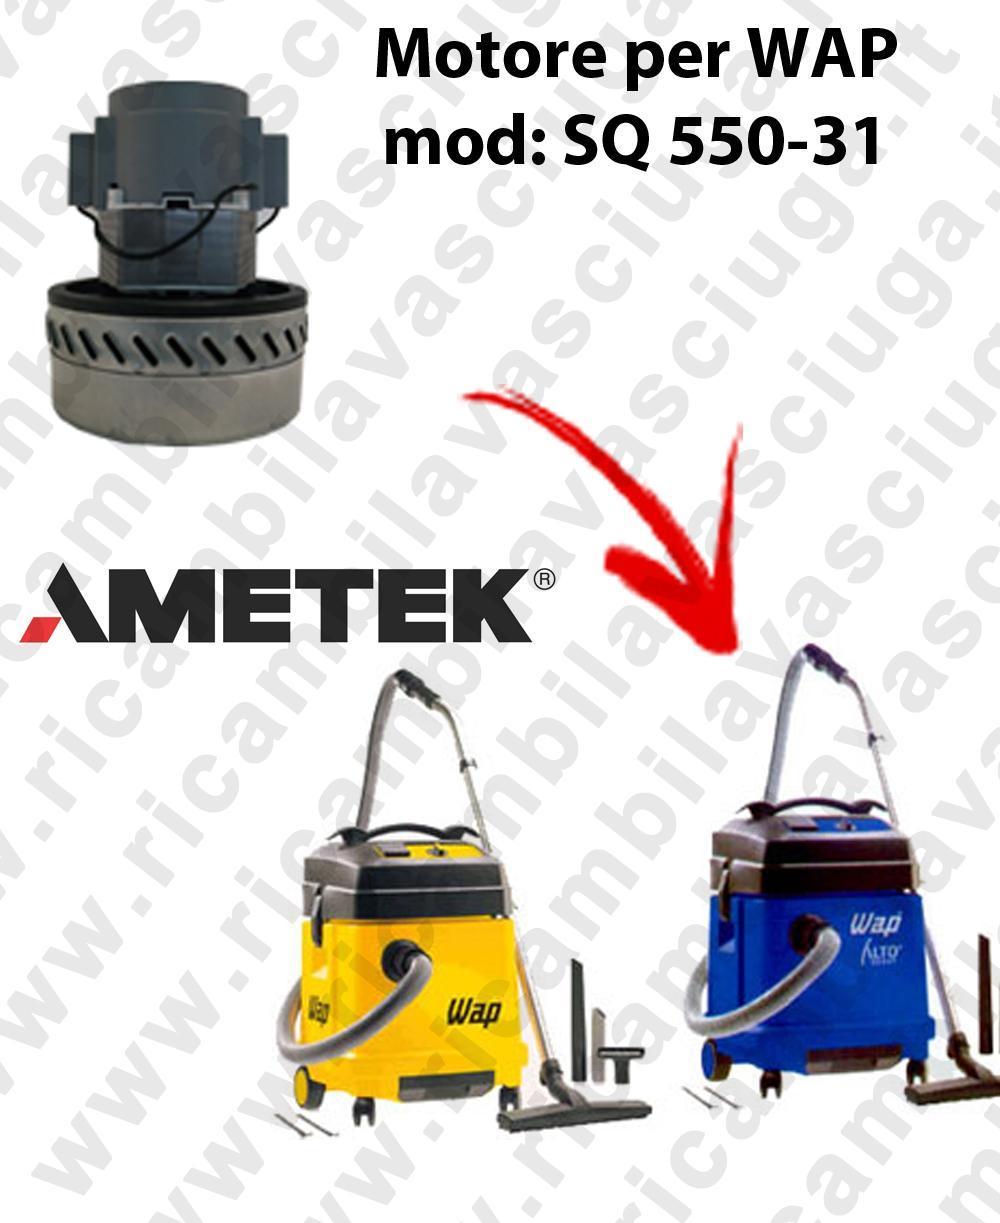 SQ 550 - 31 Motore de aspiración AMETEK  para aspiradora WAP